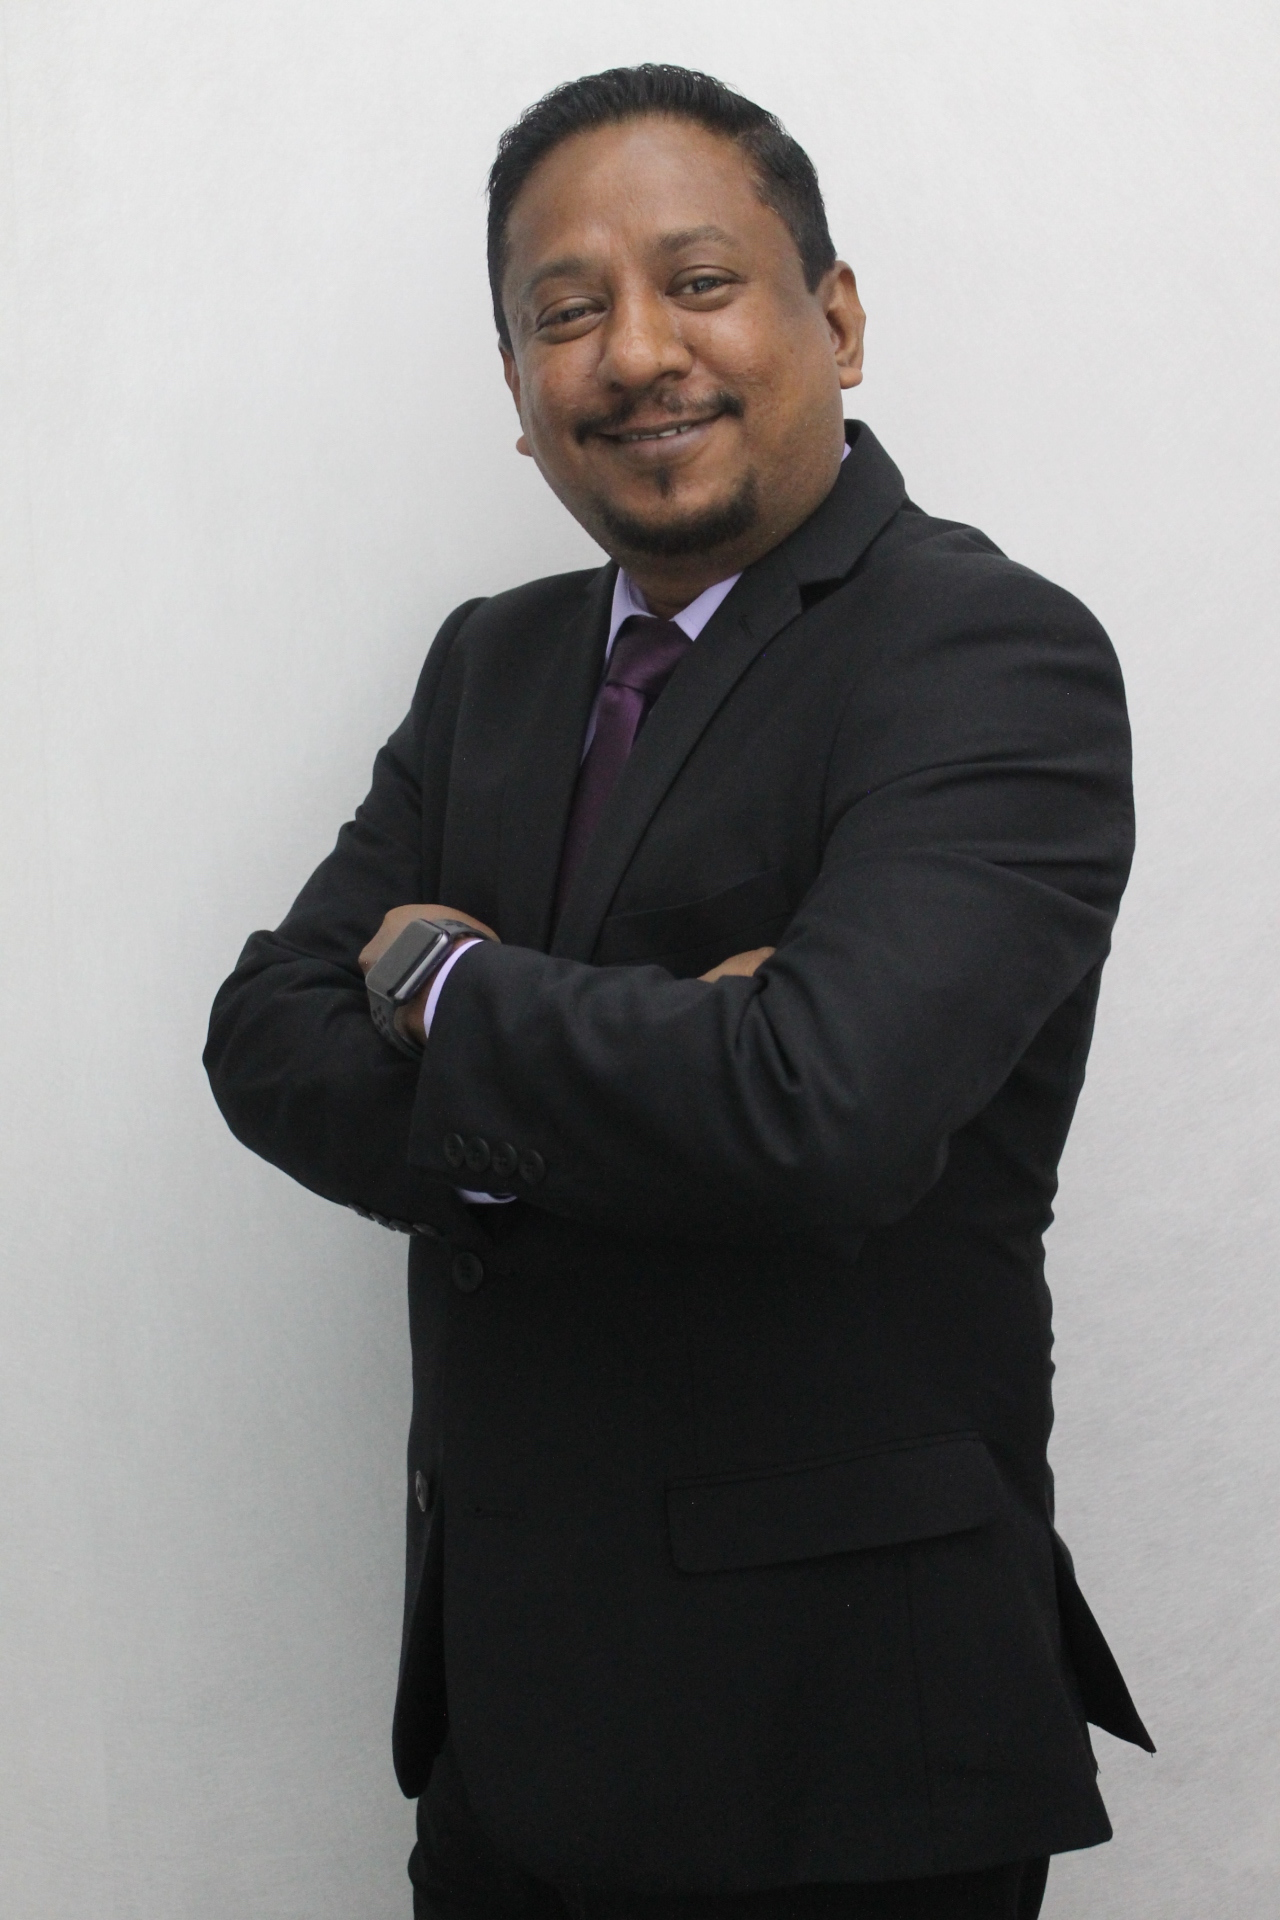 Rajiv Prasad, chief information officer at Xpandretail. Photo courtesy of Xpandretail.